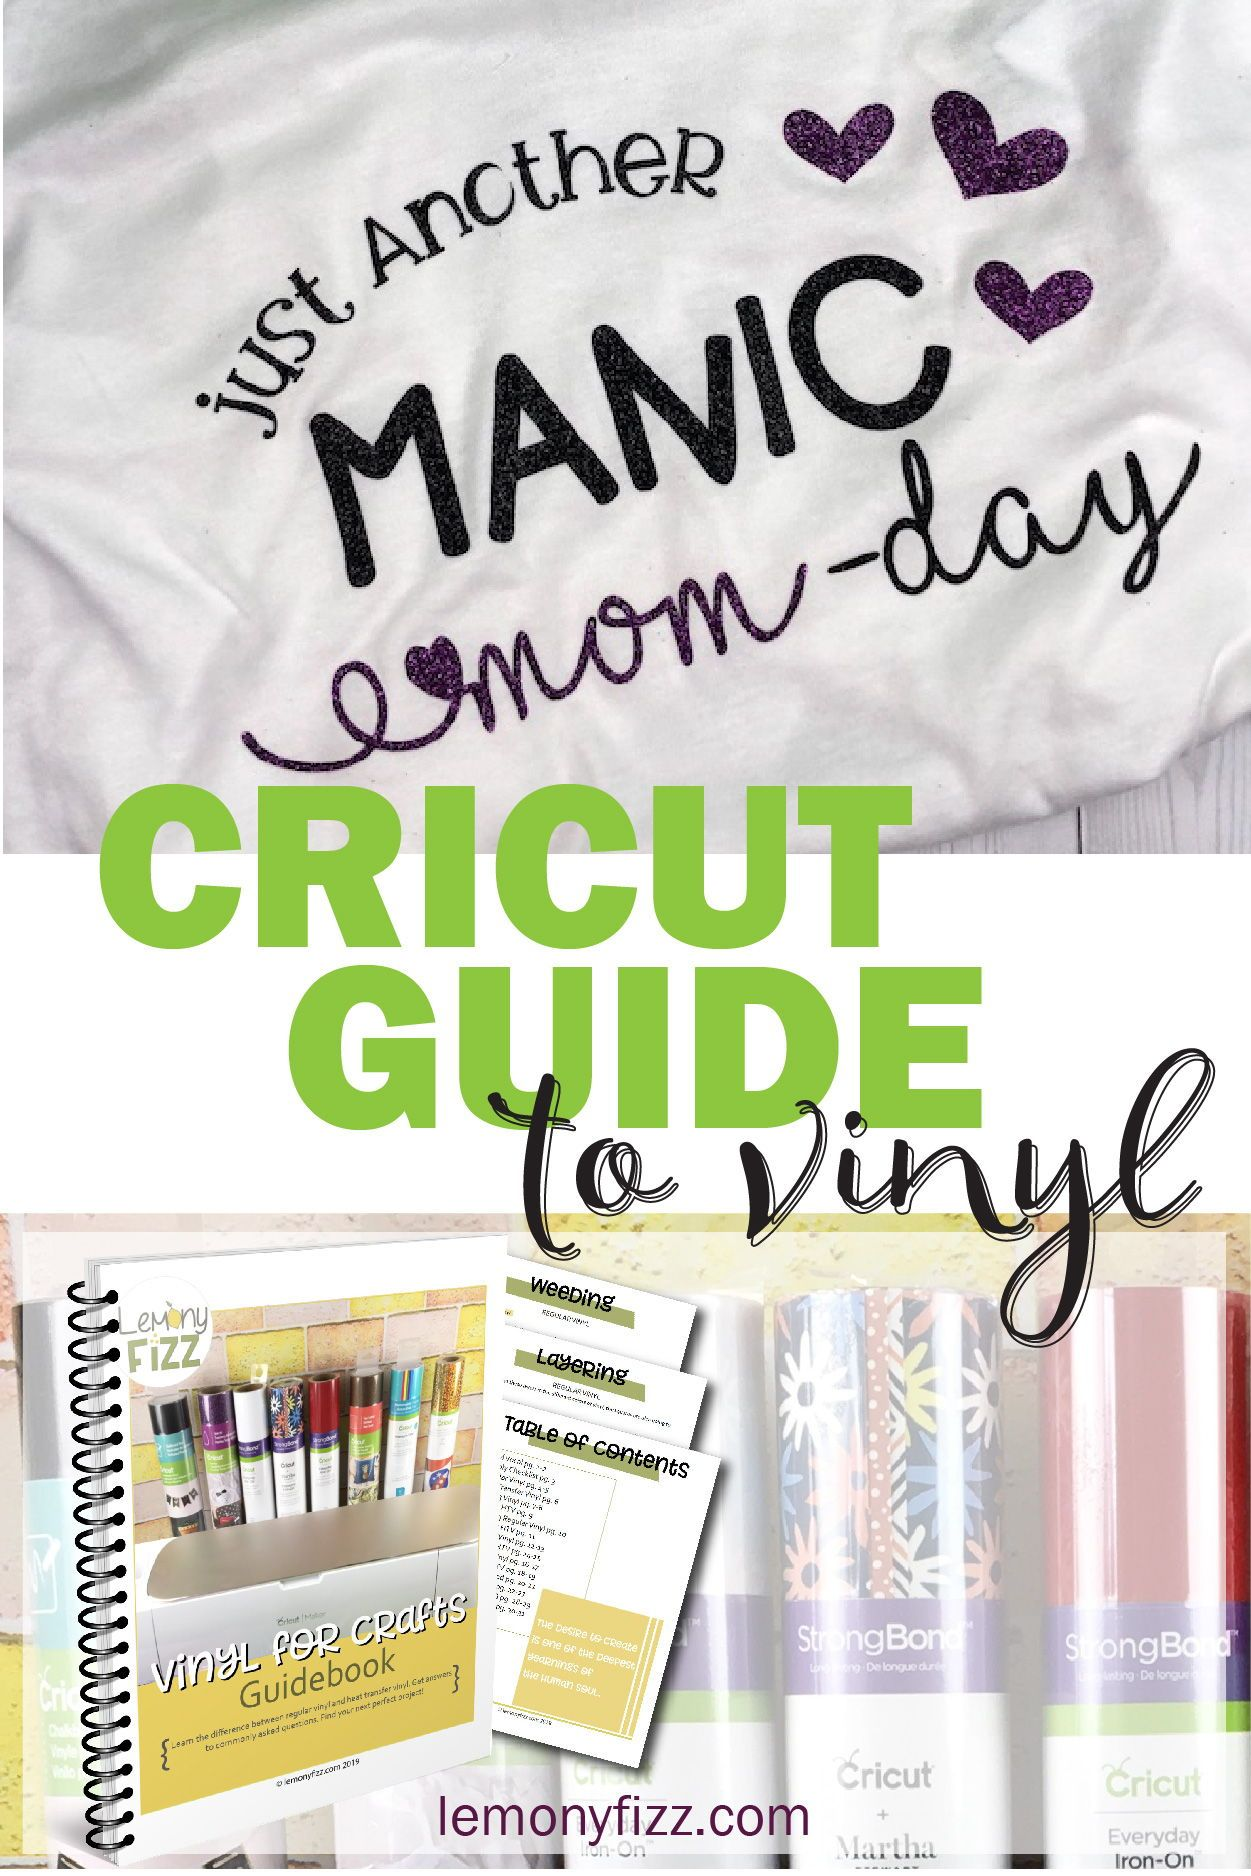 Vinyl for Crafts: A beginner's guidebook #cricutvinylprojects